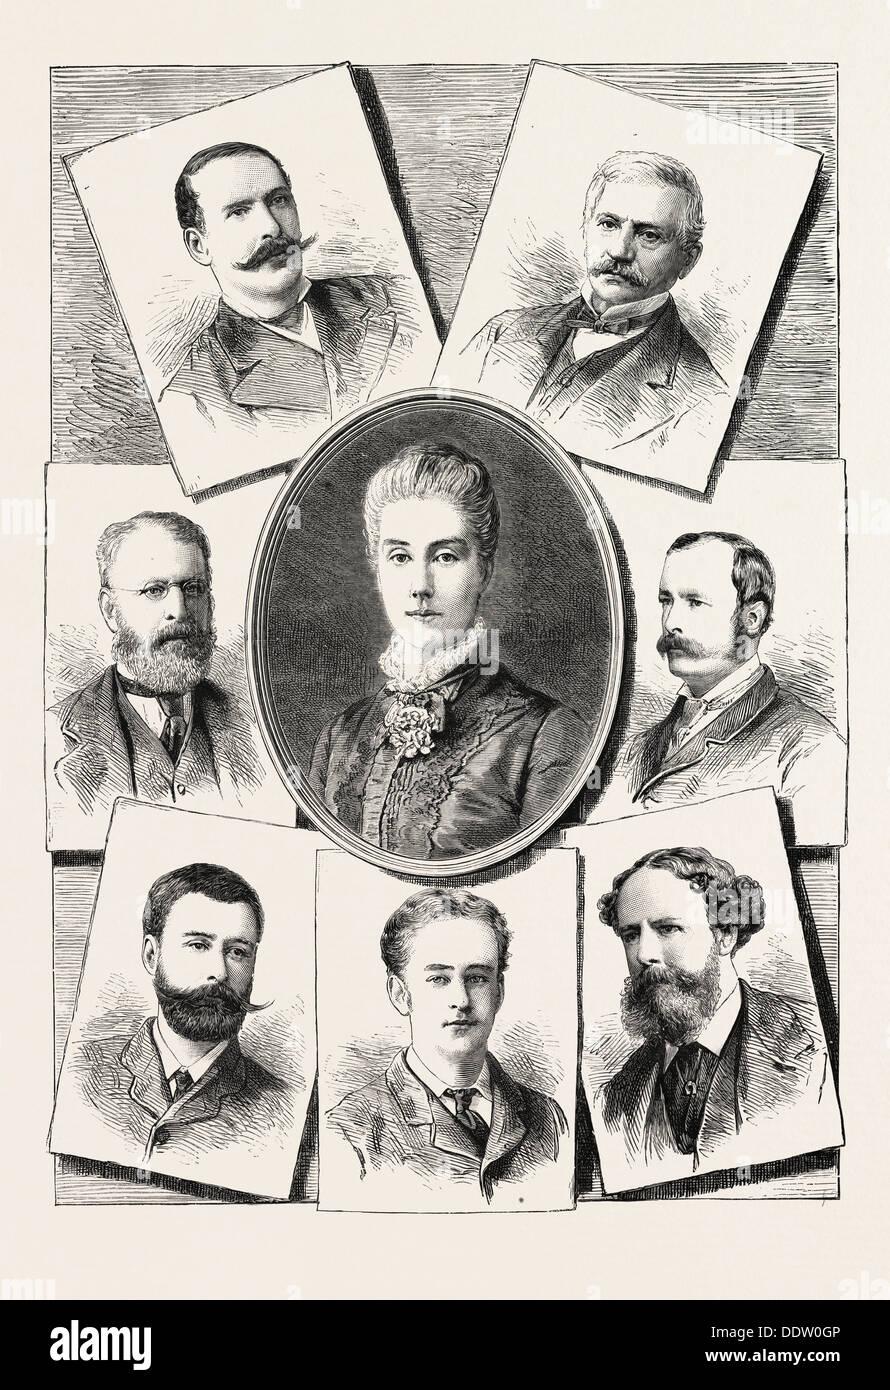 MRS. LAYARD LORD GEORGE MONTAGU (ATTACHE) - Stock Image